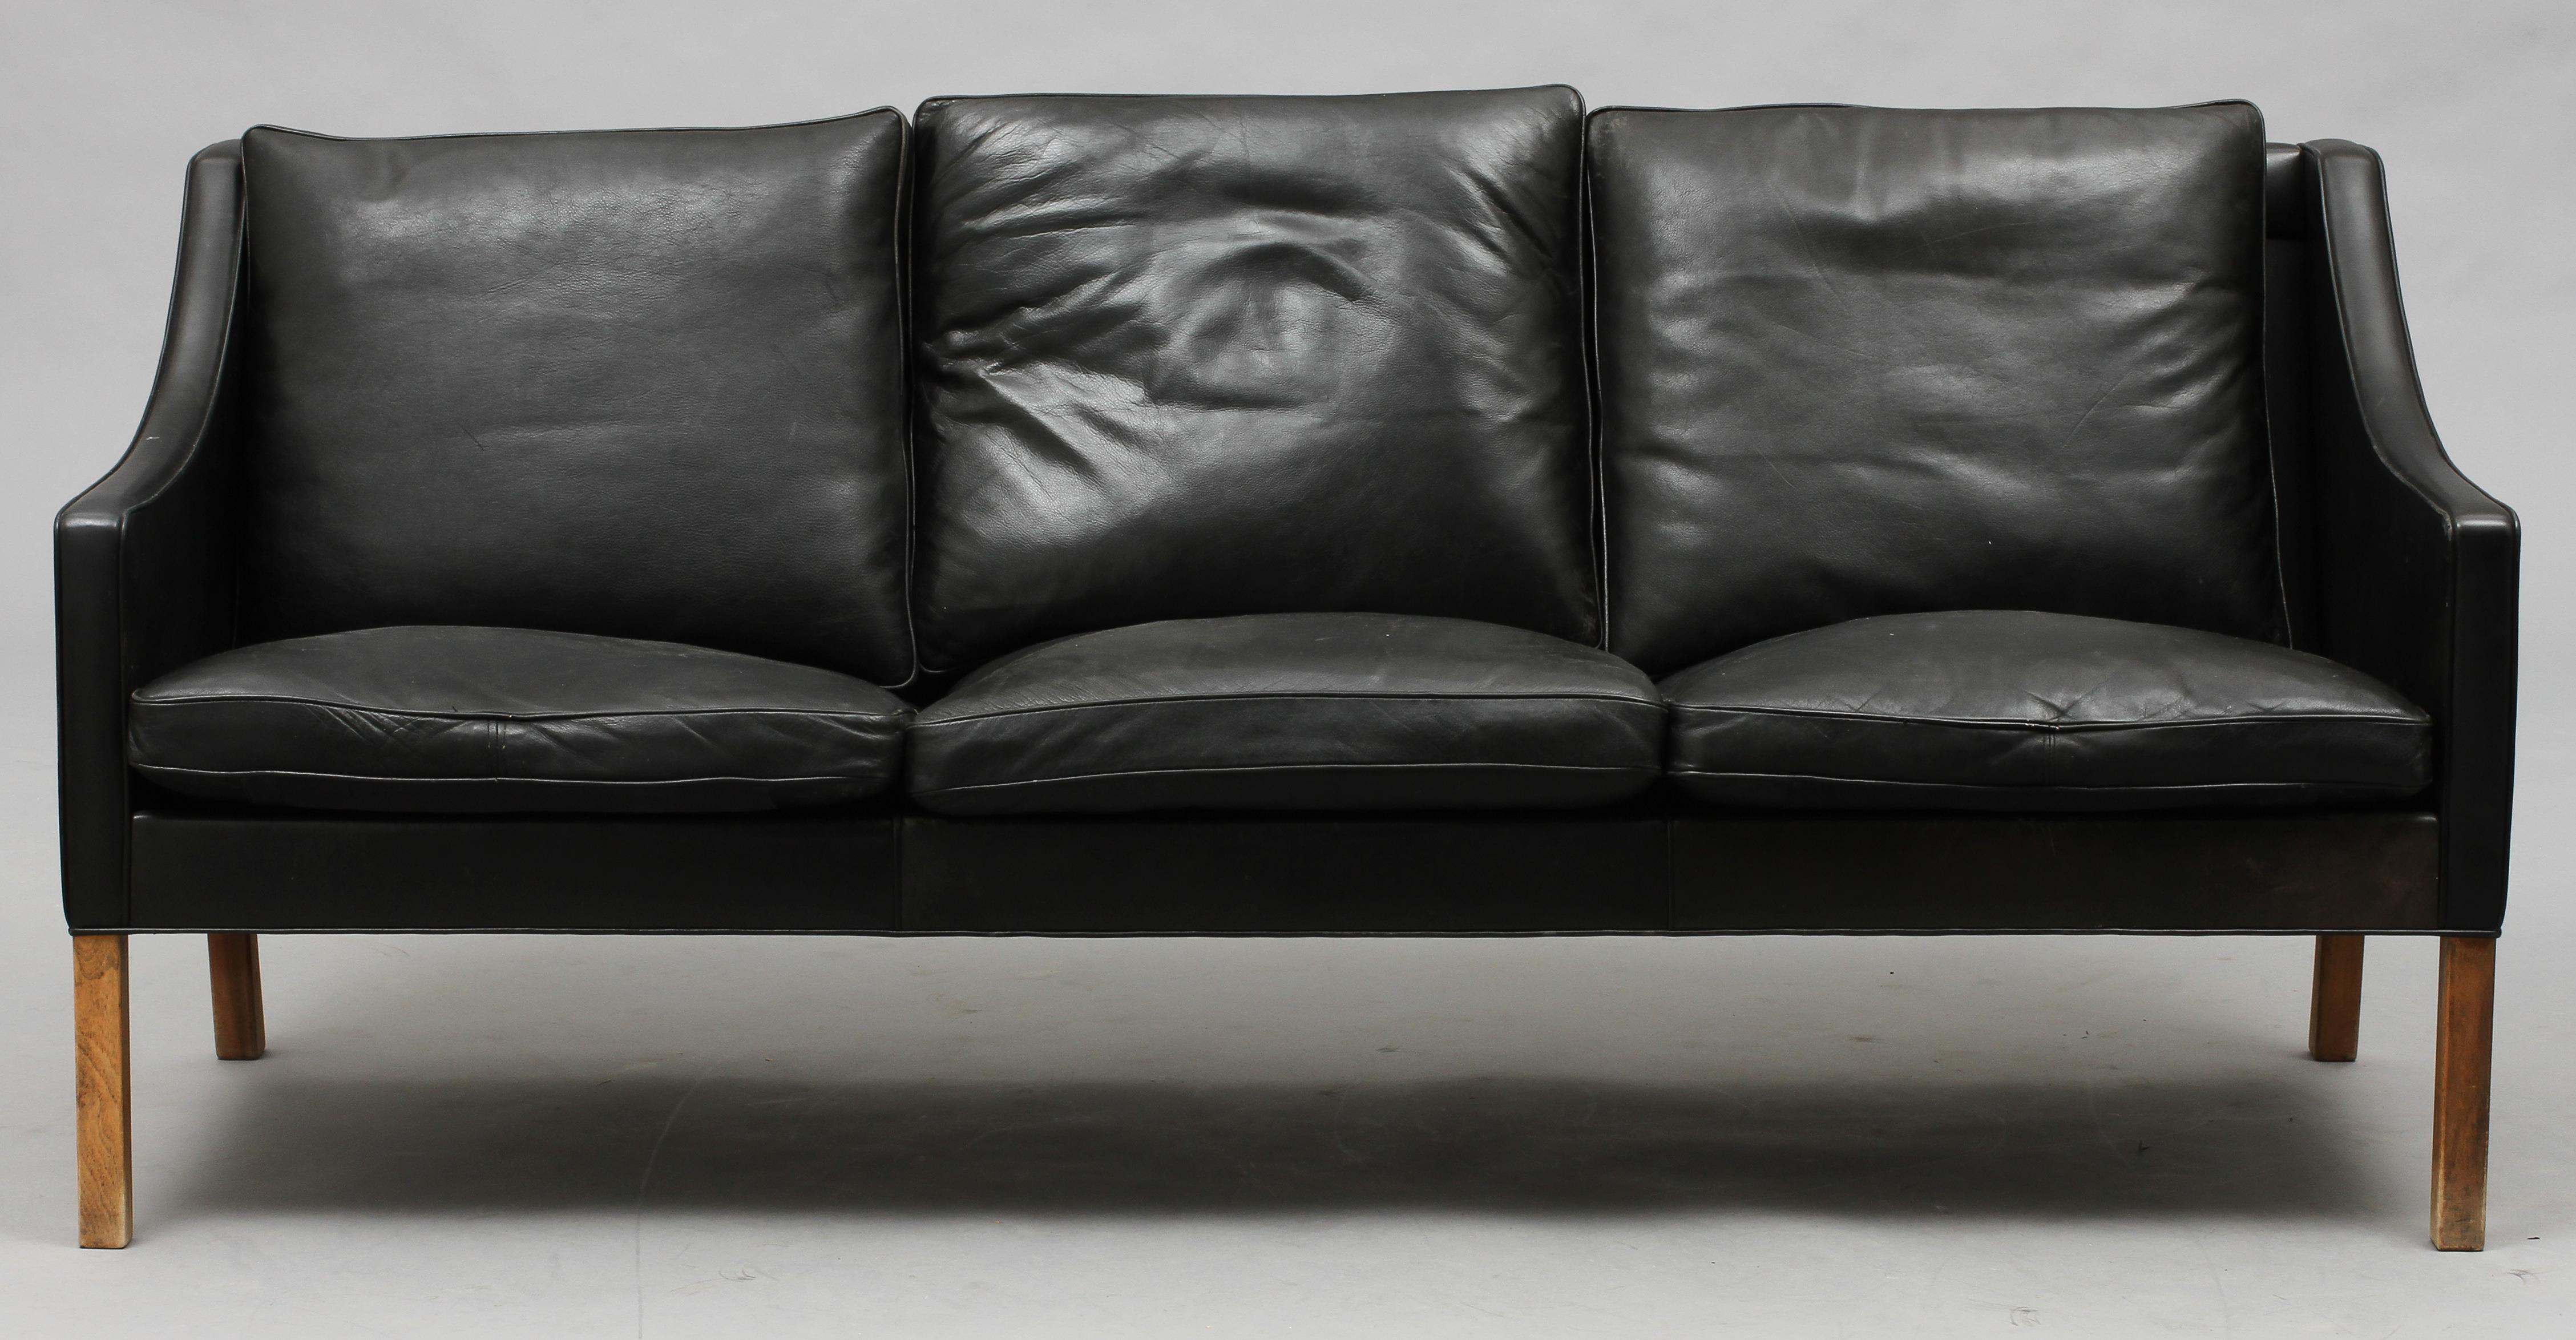 borge mogensen sofa model 2209 art deco sofas on gumtree soffa samt fatolj fredericia stolefabrik danmark furniture seatings auctionet